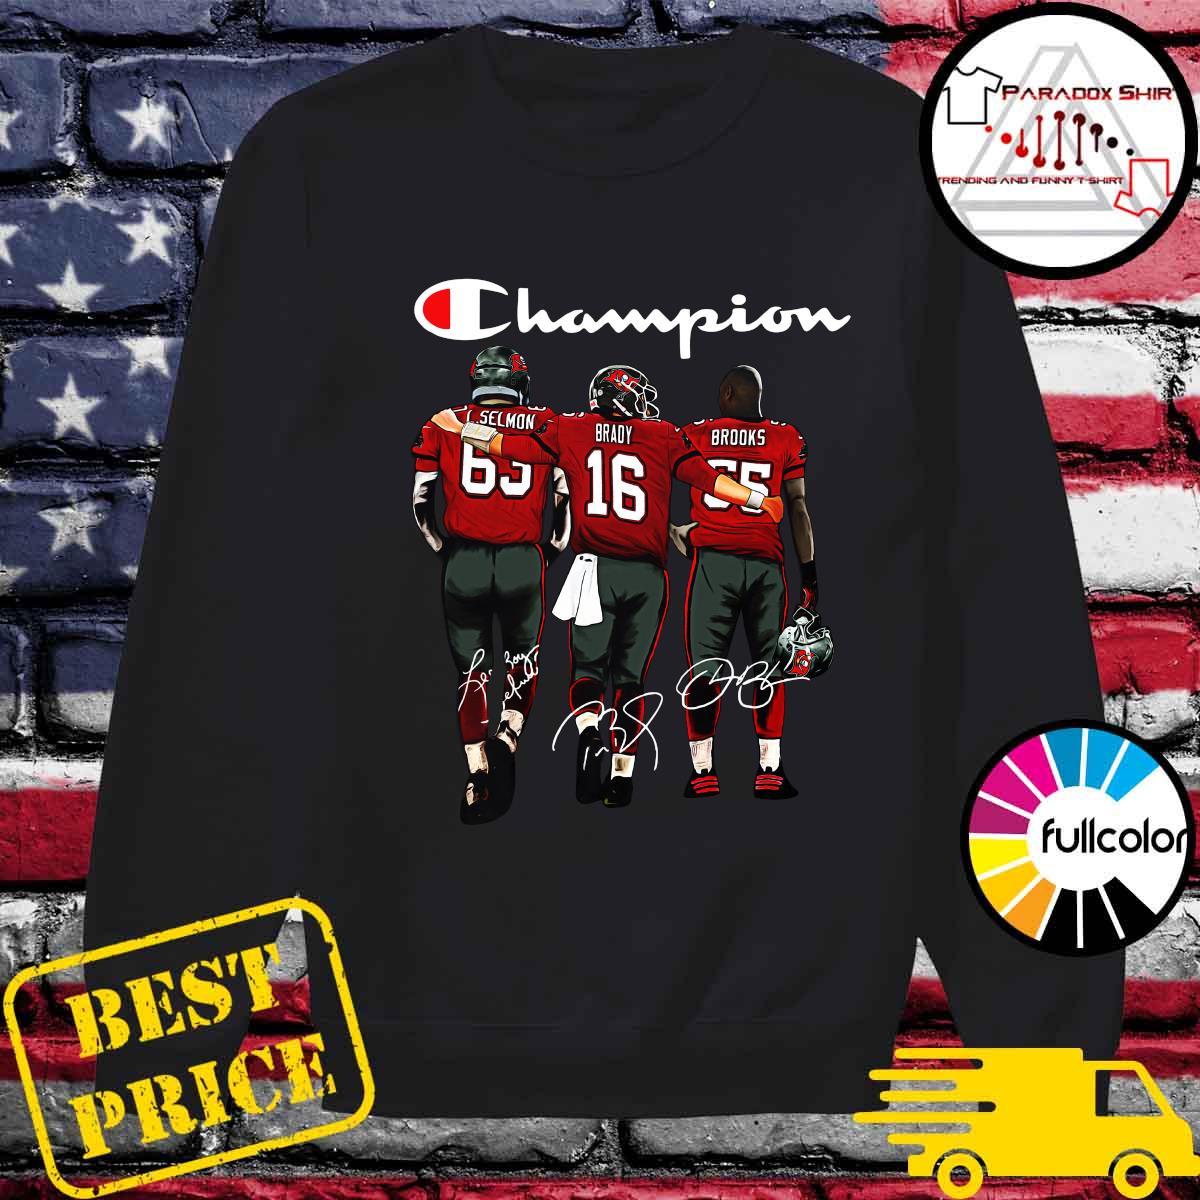 Champion Tampa Bay Buccaneers Lee Roy Selmon 63 Tom Brady 16 Derrick Brooks 55 Signatures Shirt Sweater